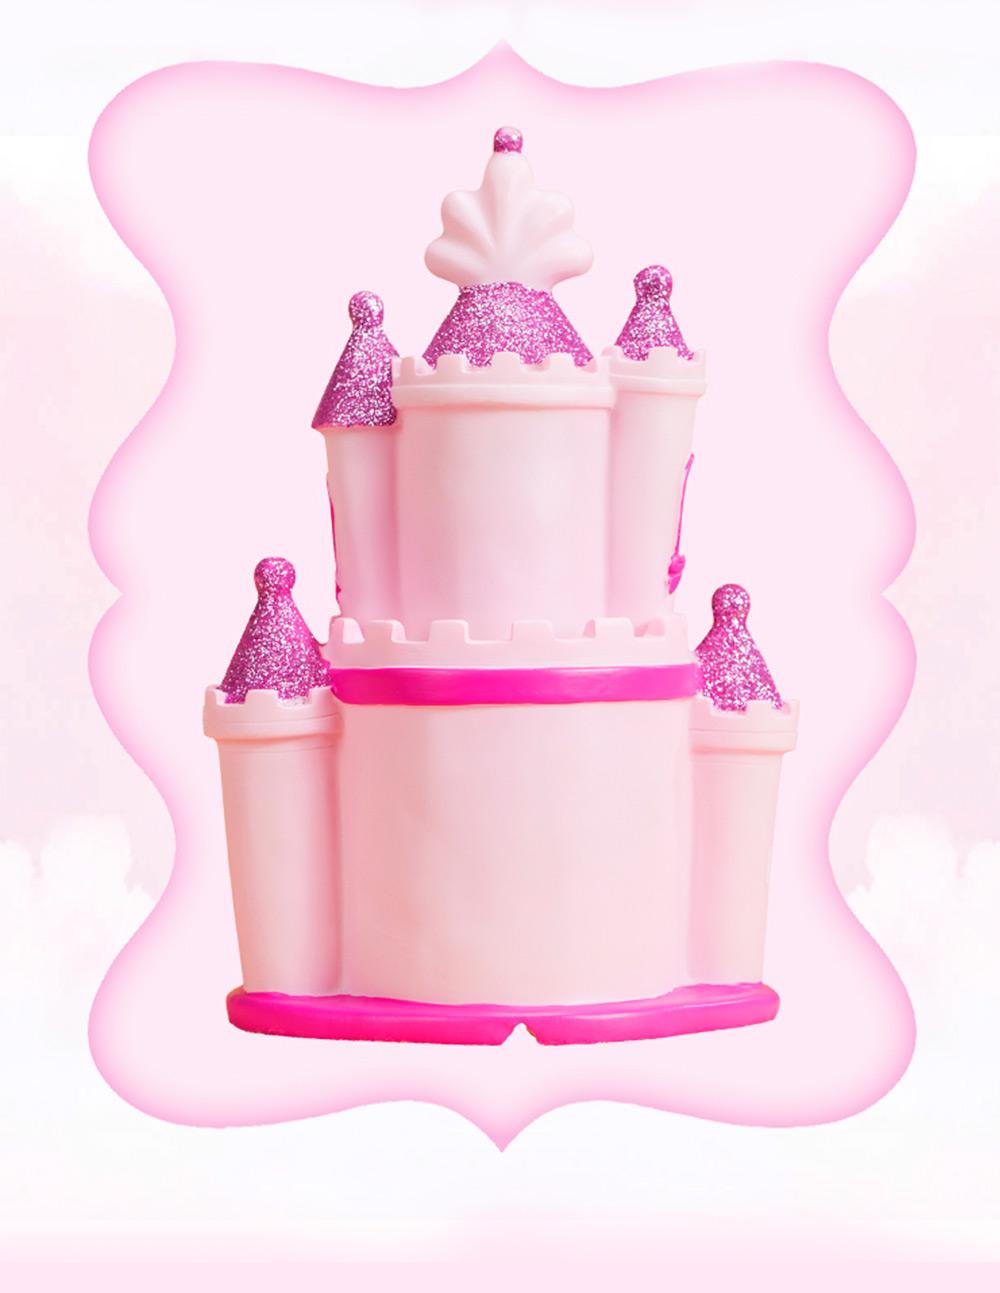 Creative Princess Castle Money Box for Girls, Delicate Elegant Pink Fairytale Castle Birthday Present Piggy Bank 1